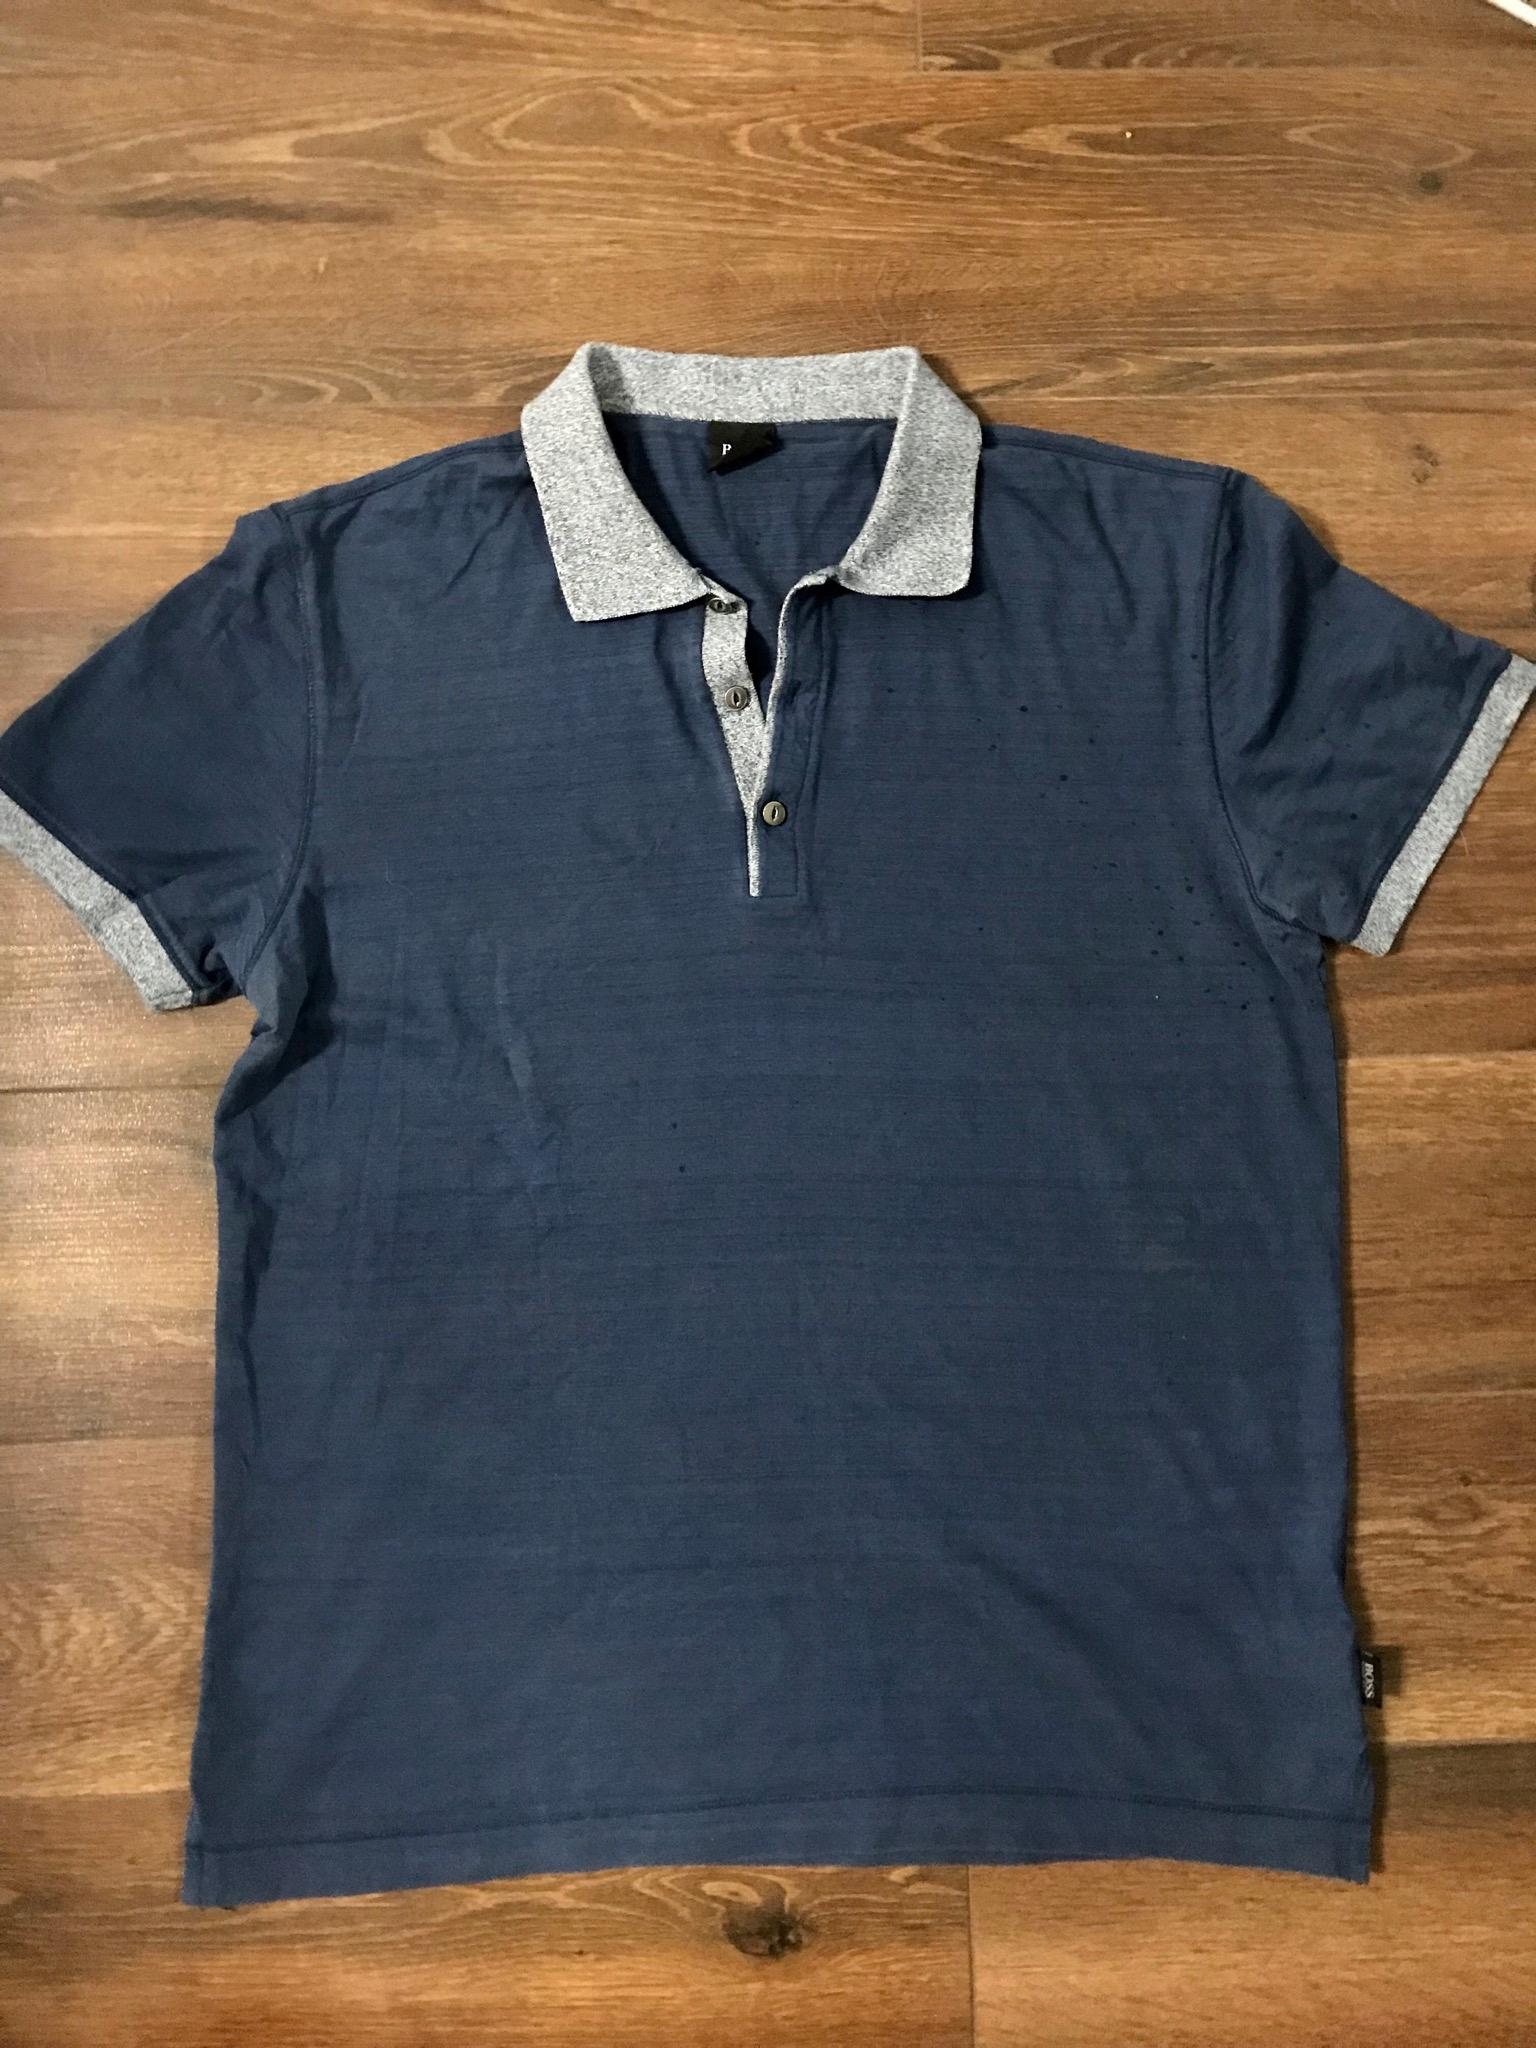 Hugo Boss koszulka polo męska M-L jak nowa